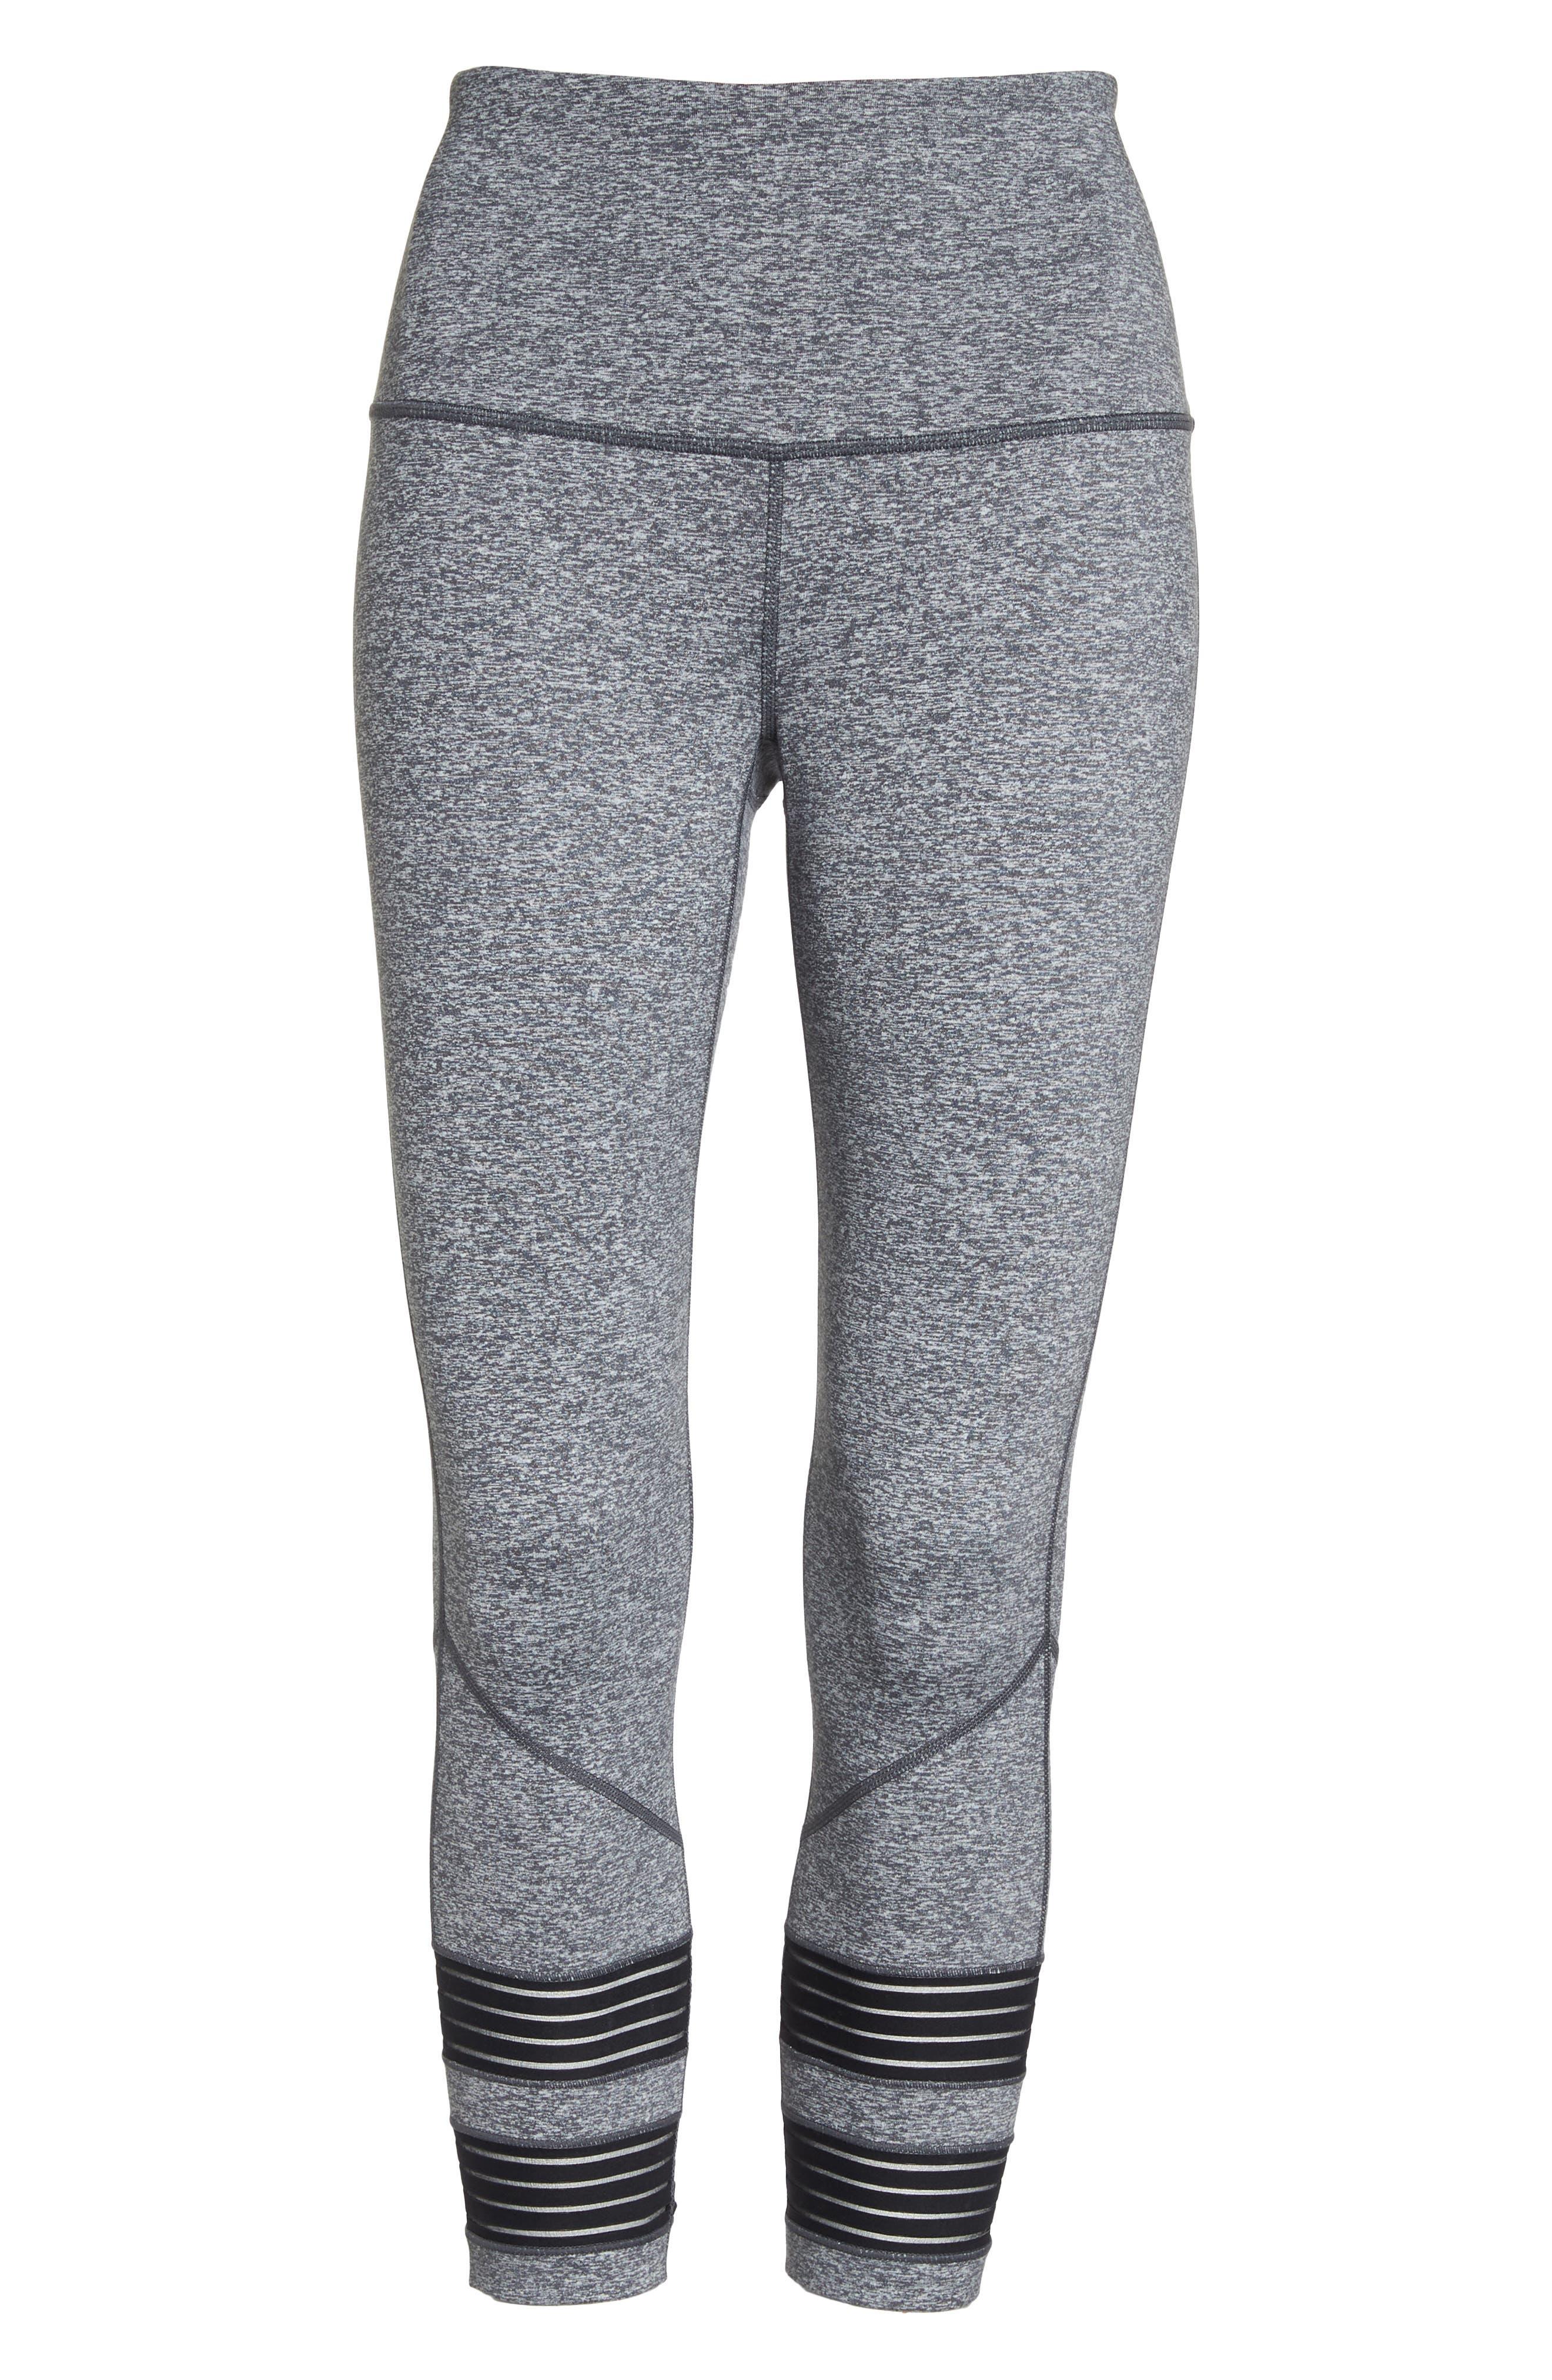 High Waist Twin Crop Leggings,                             Alternate thumbnail 7, color,                             Grey Graphite